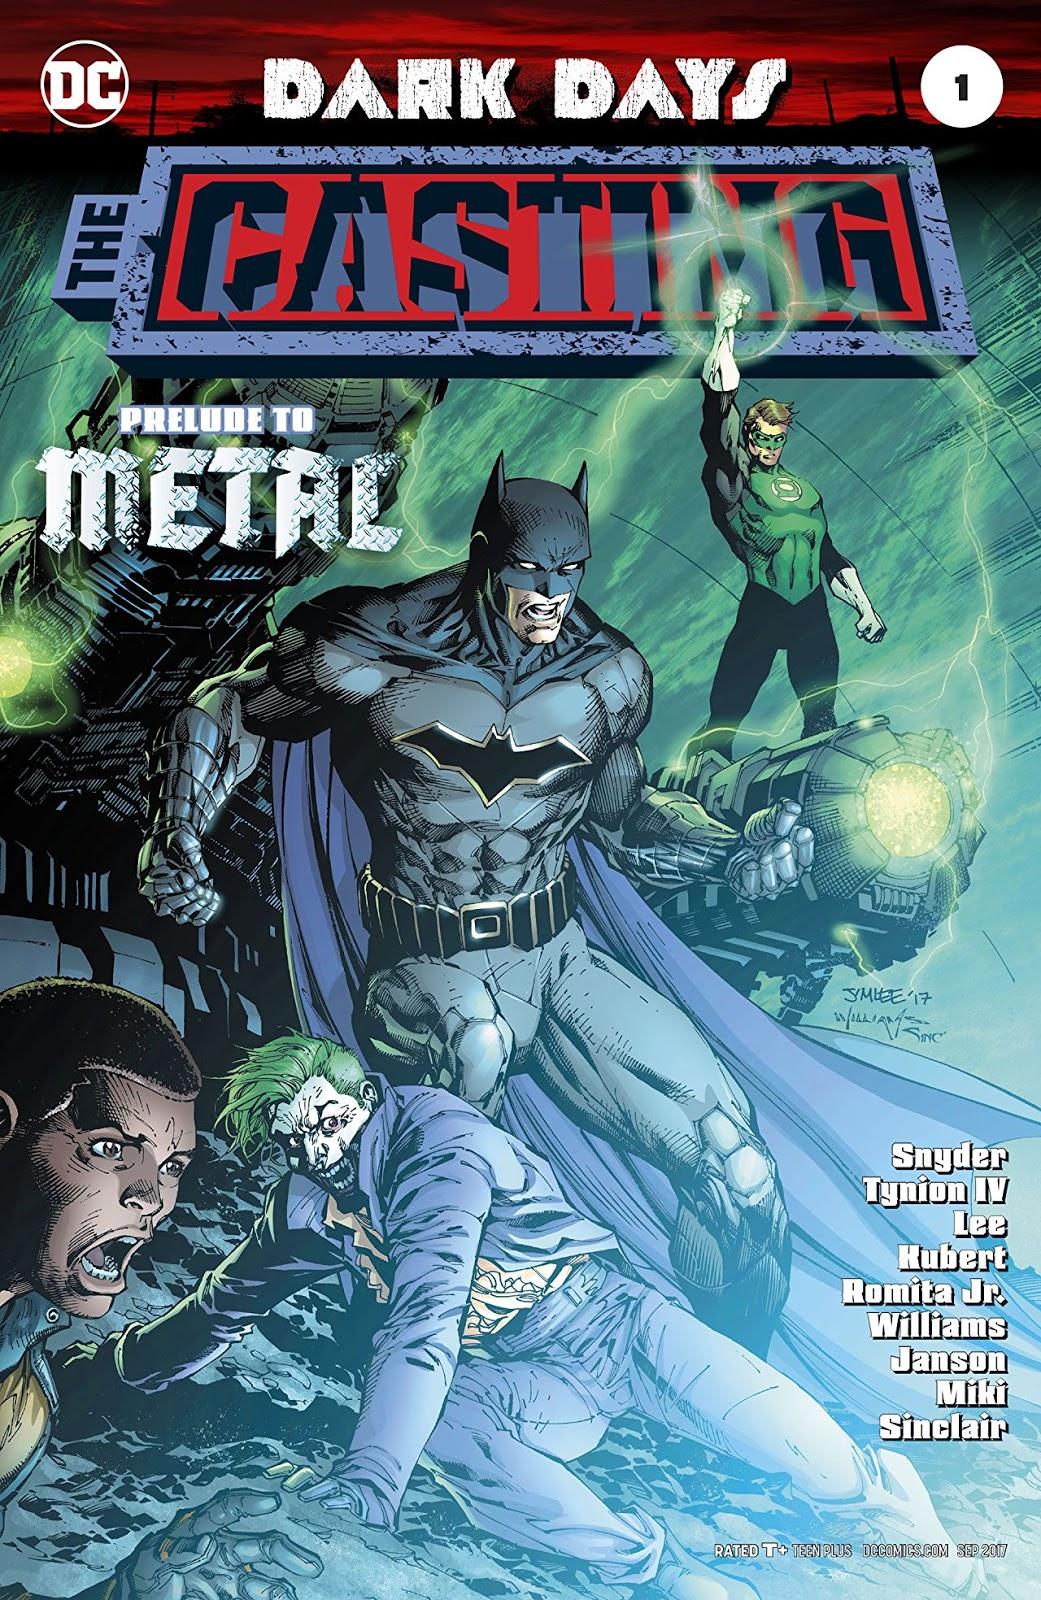 Action Comics 983 2017 Webrip The Last Kryptonian Dcp Cbr Size 28 35 Mb